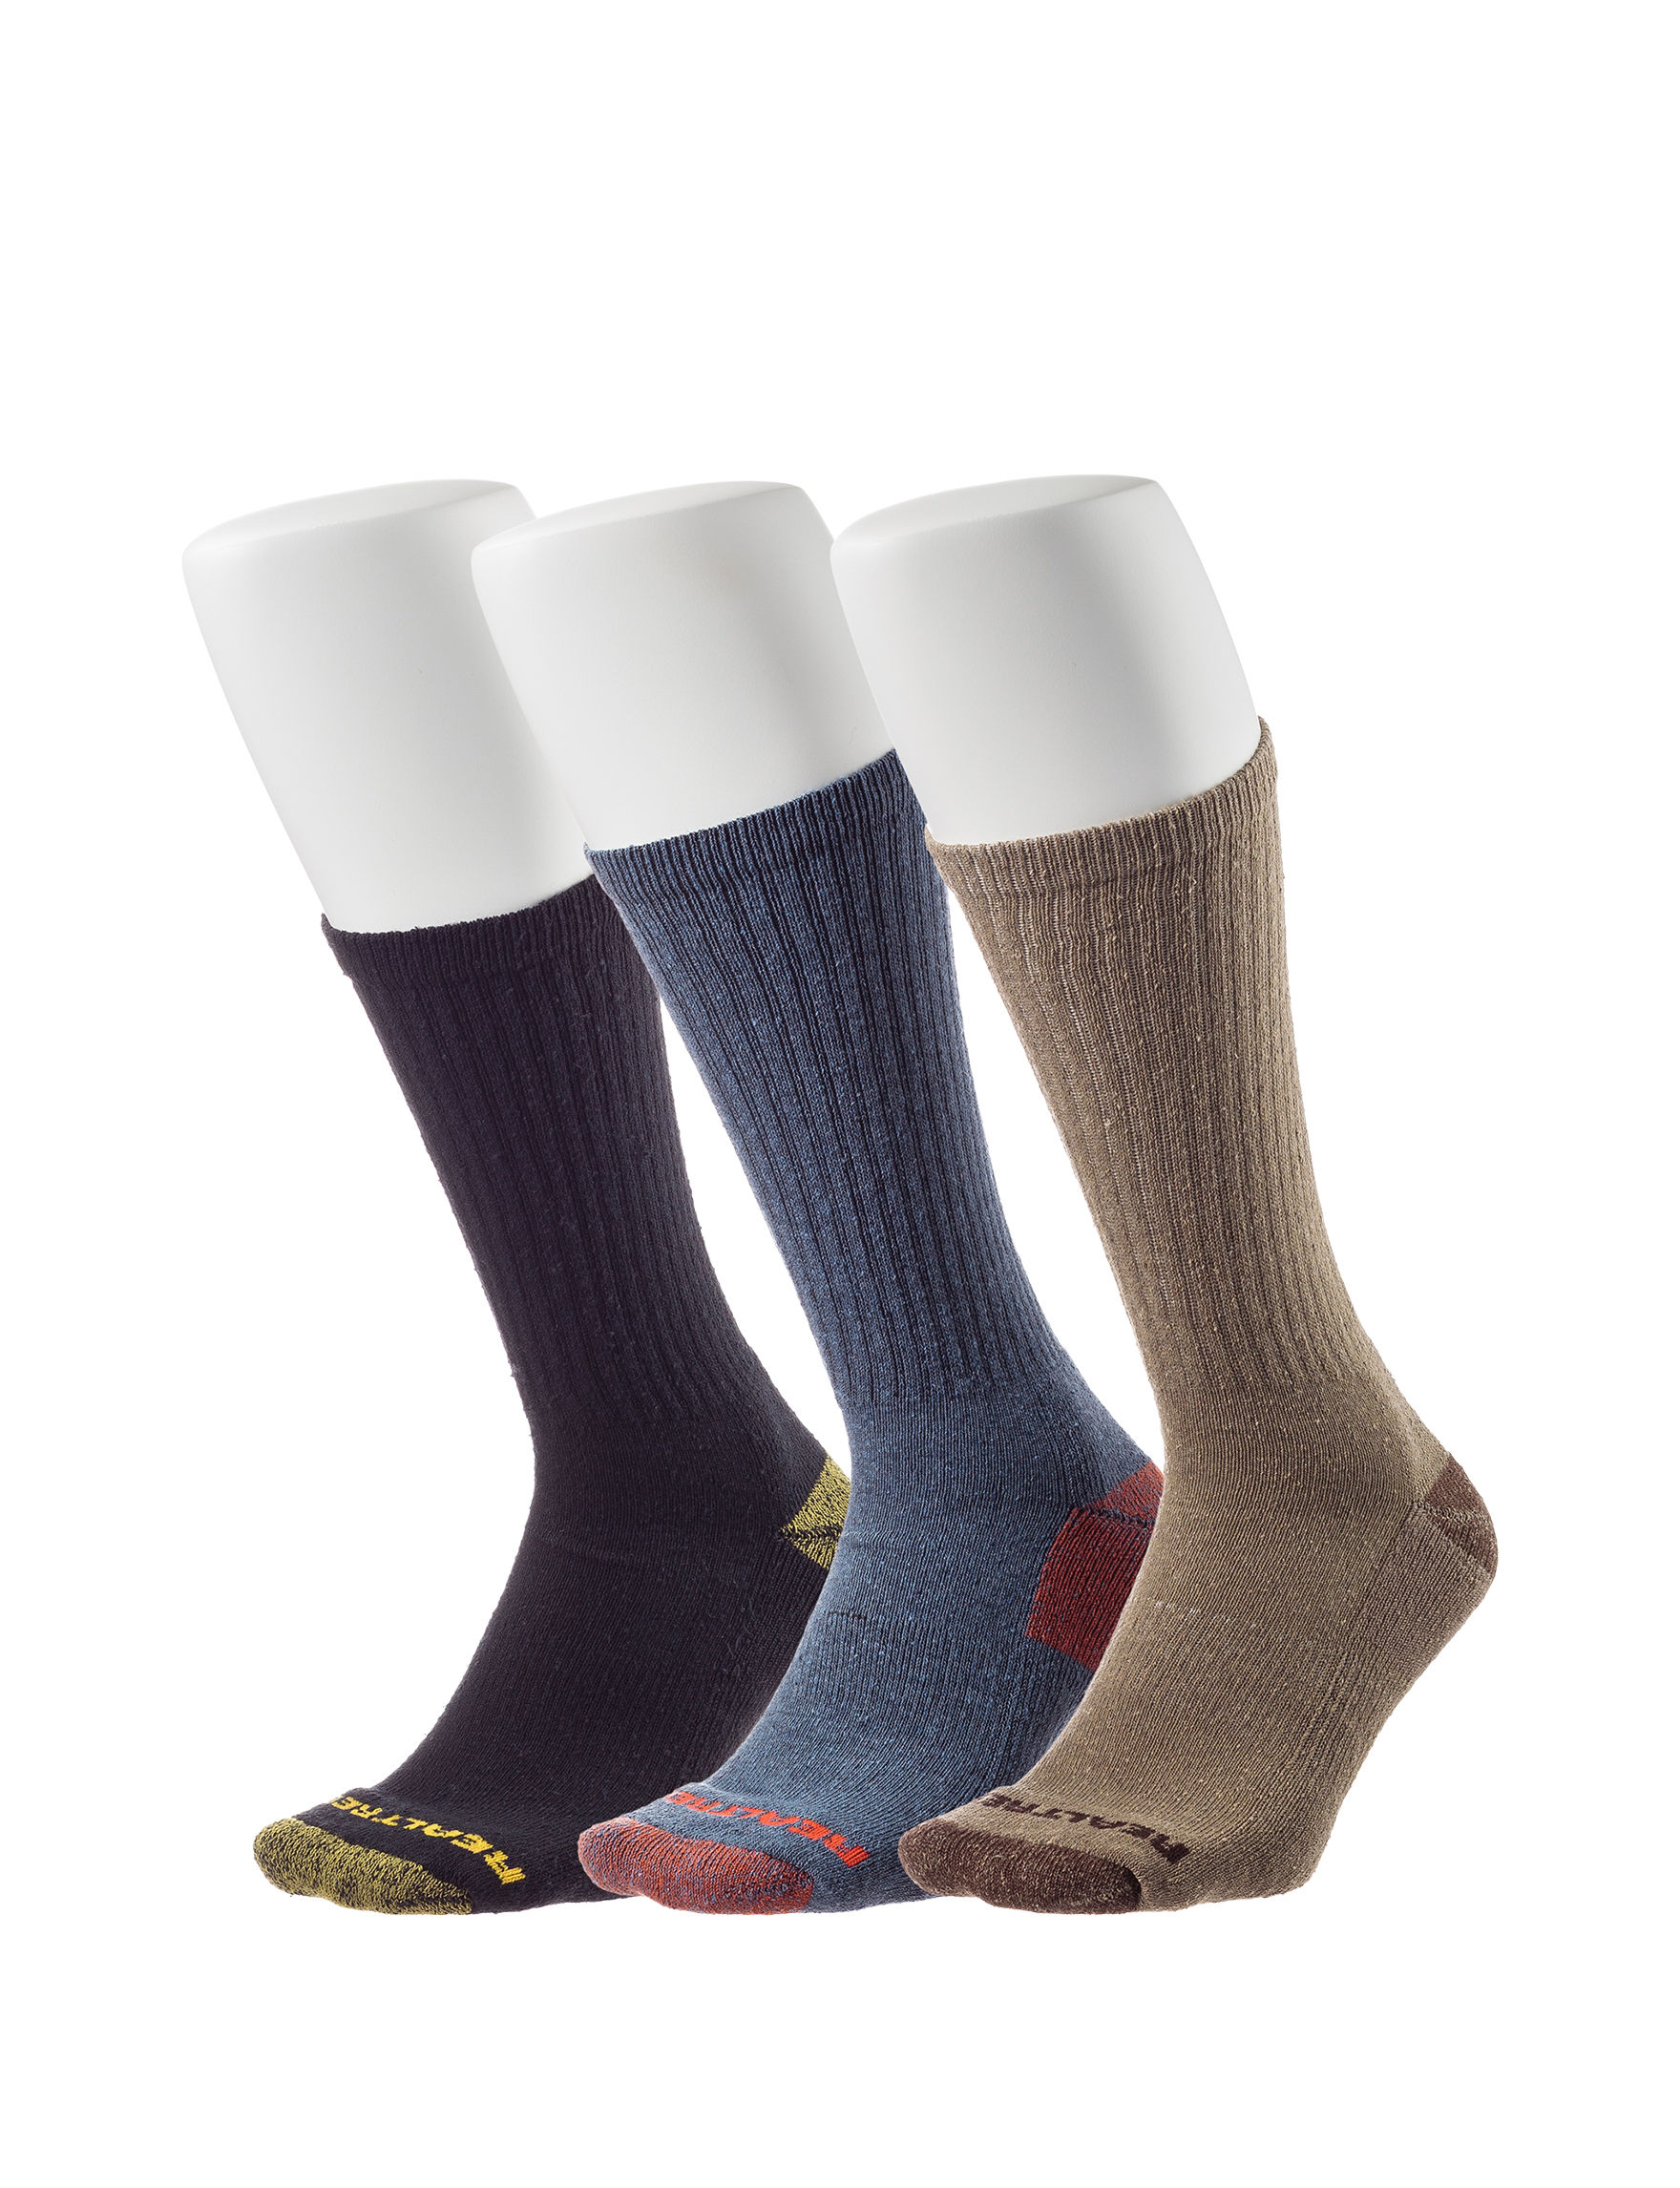 Realtree Assorted Socks